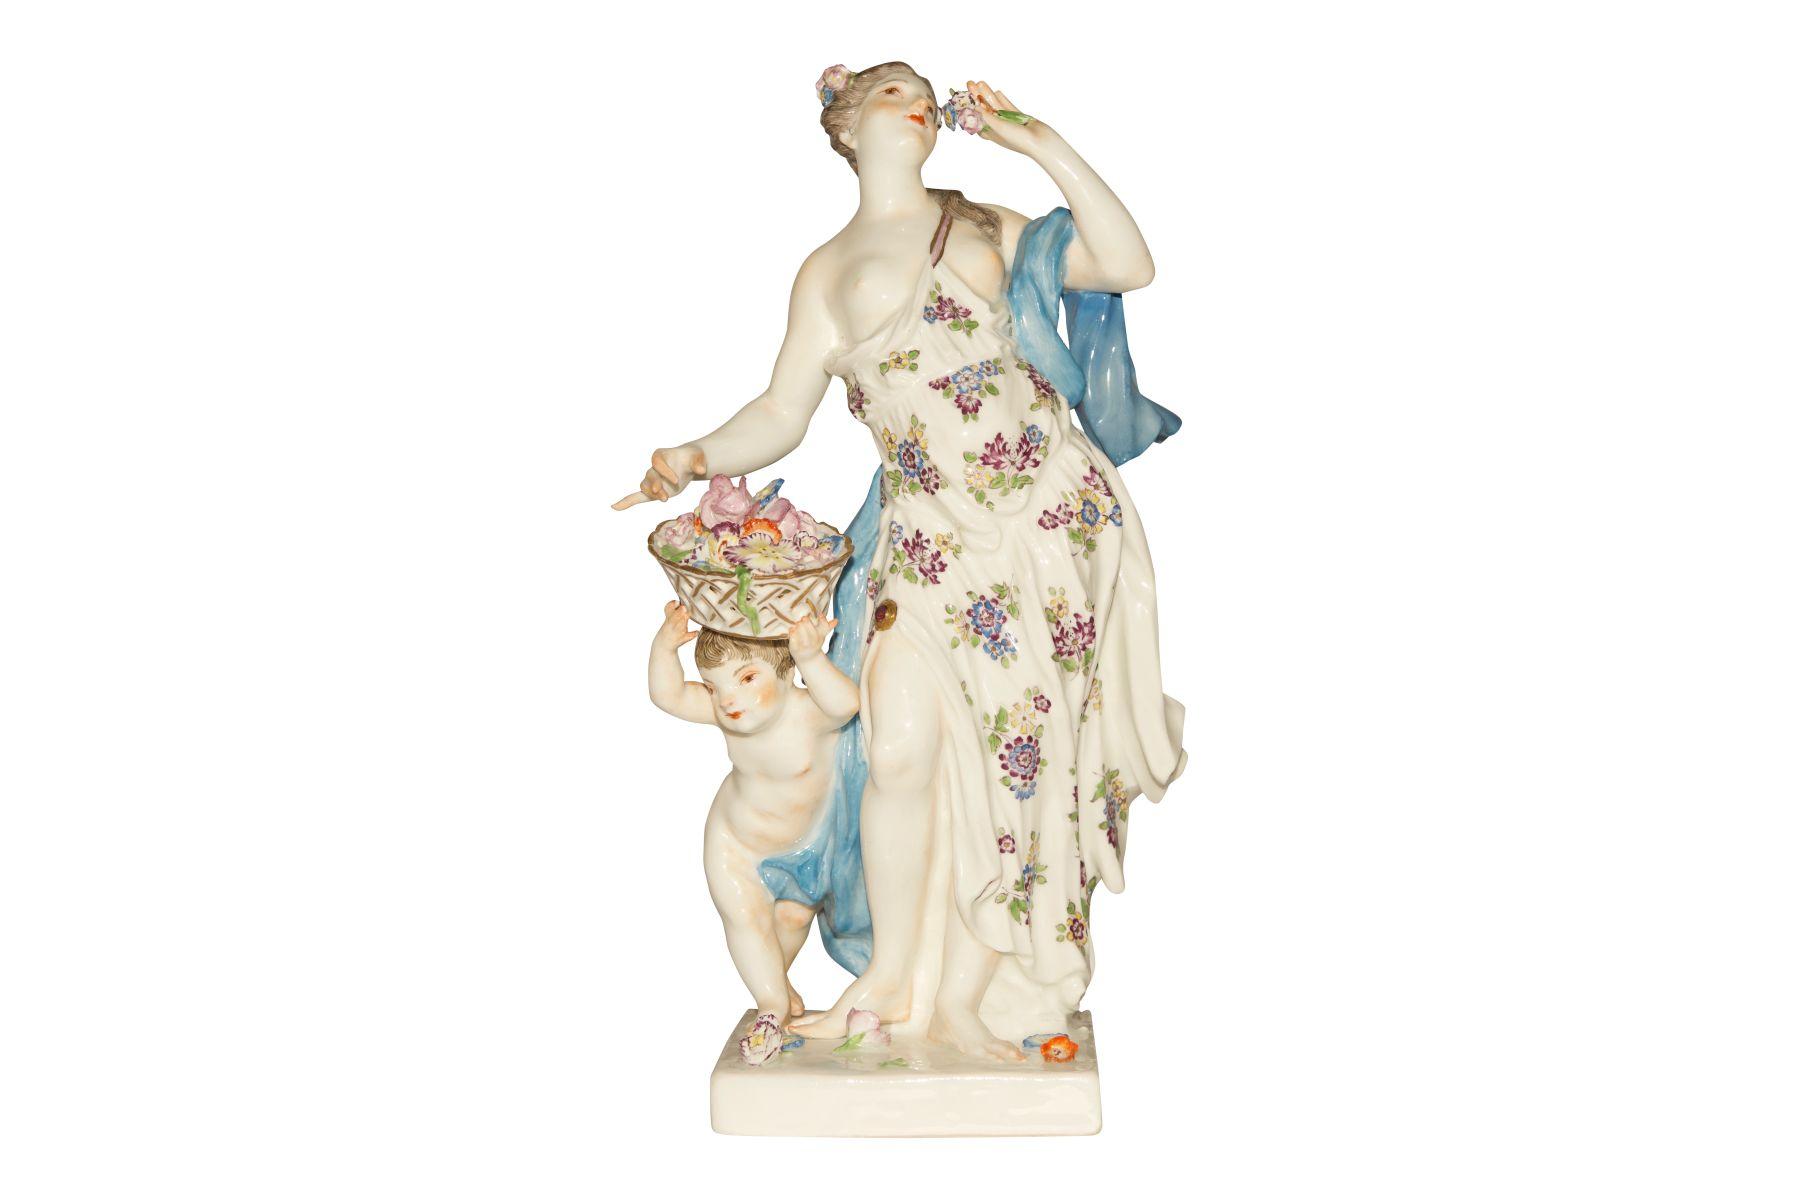 "#51 Spring figure Meissen 1750 | Grosse Figur""Frühling"" Meissen 1750 Image"